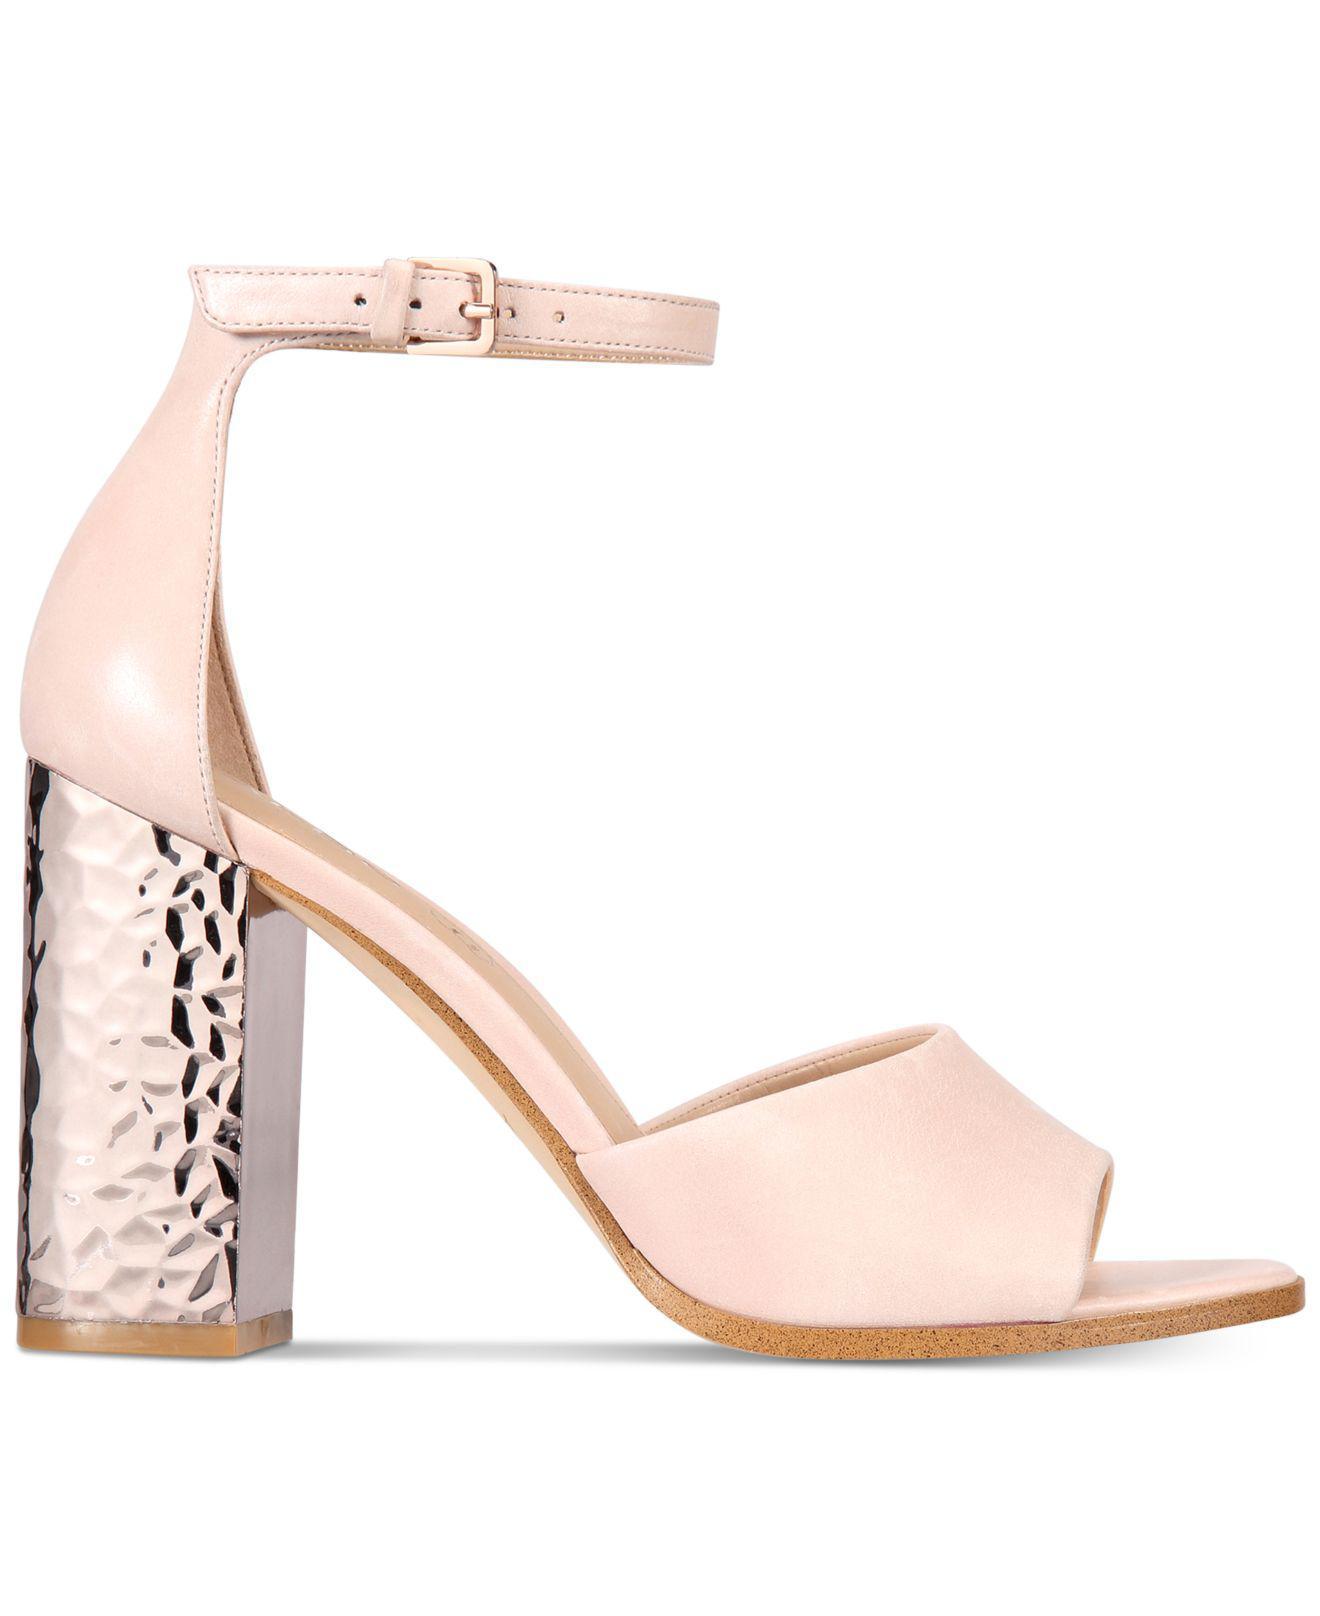 Block Women's Two Nilia Pink Piece Sandals Heel Aldo H9IbeYWED2